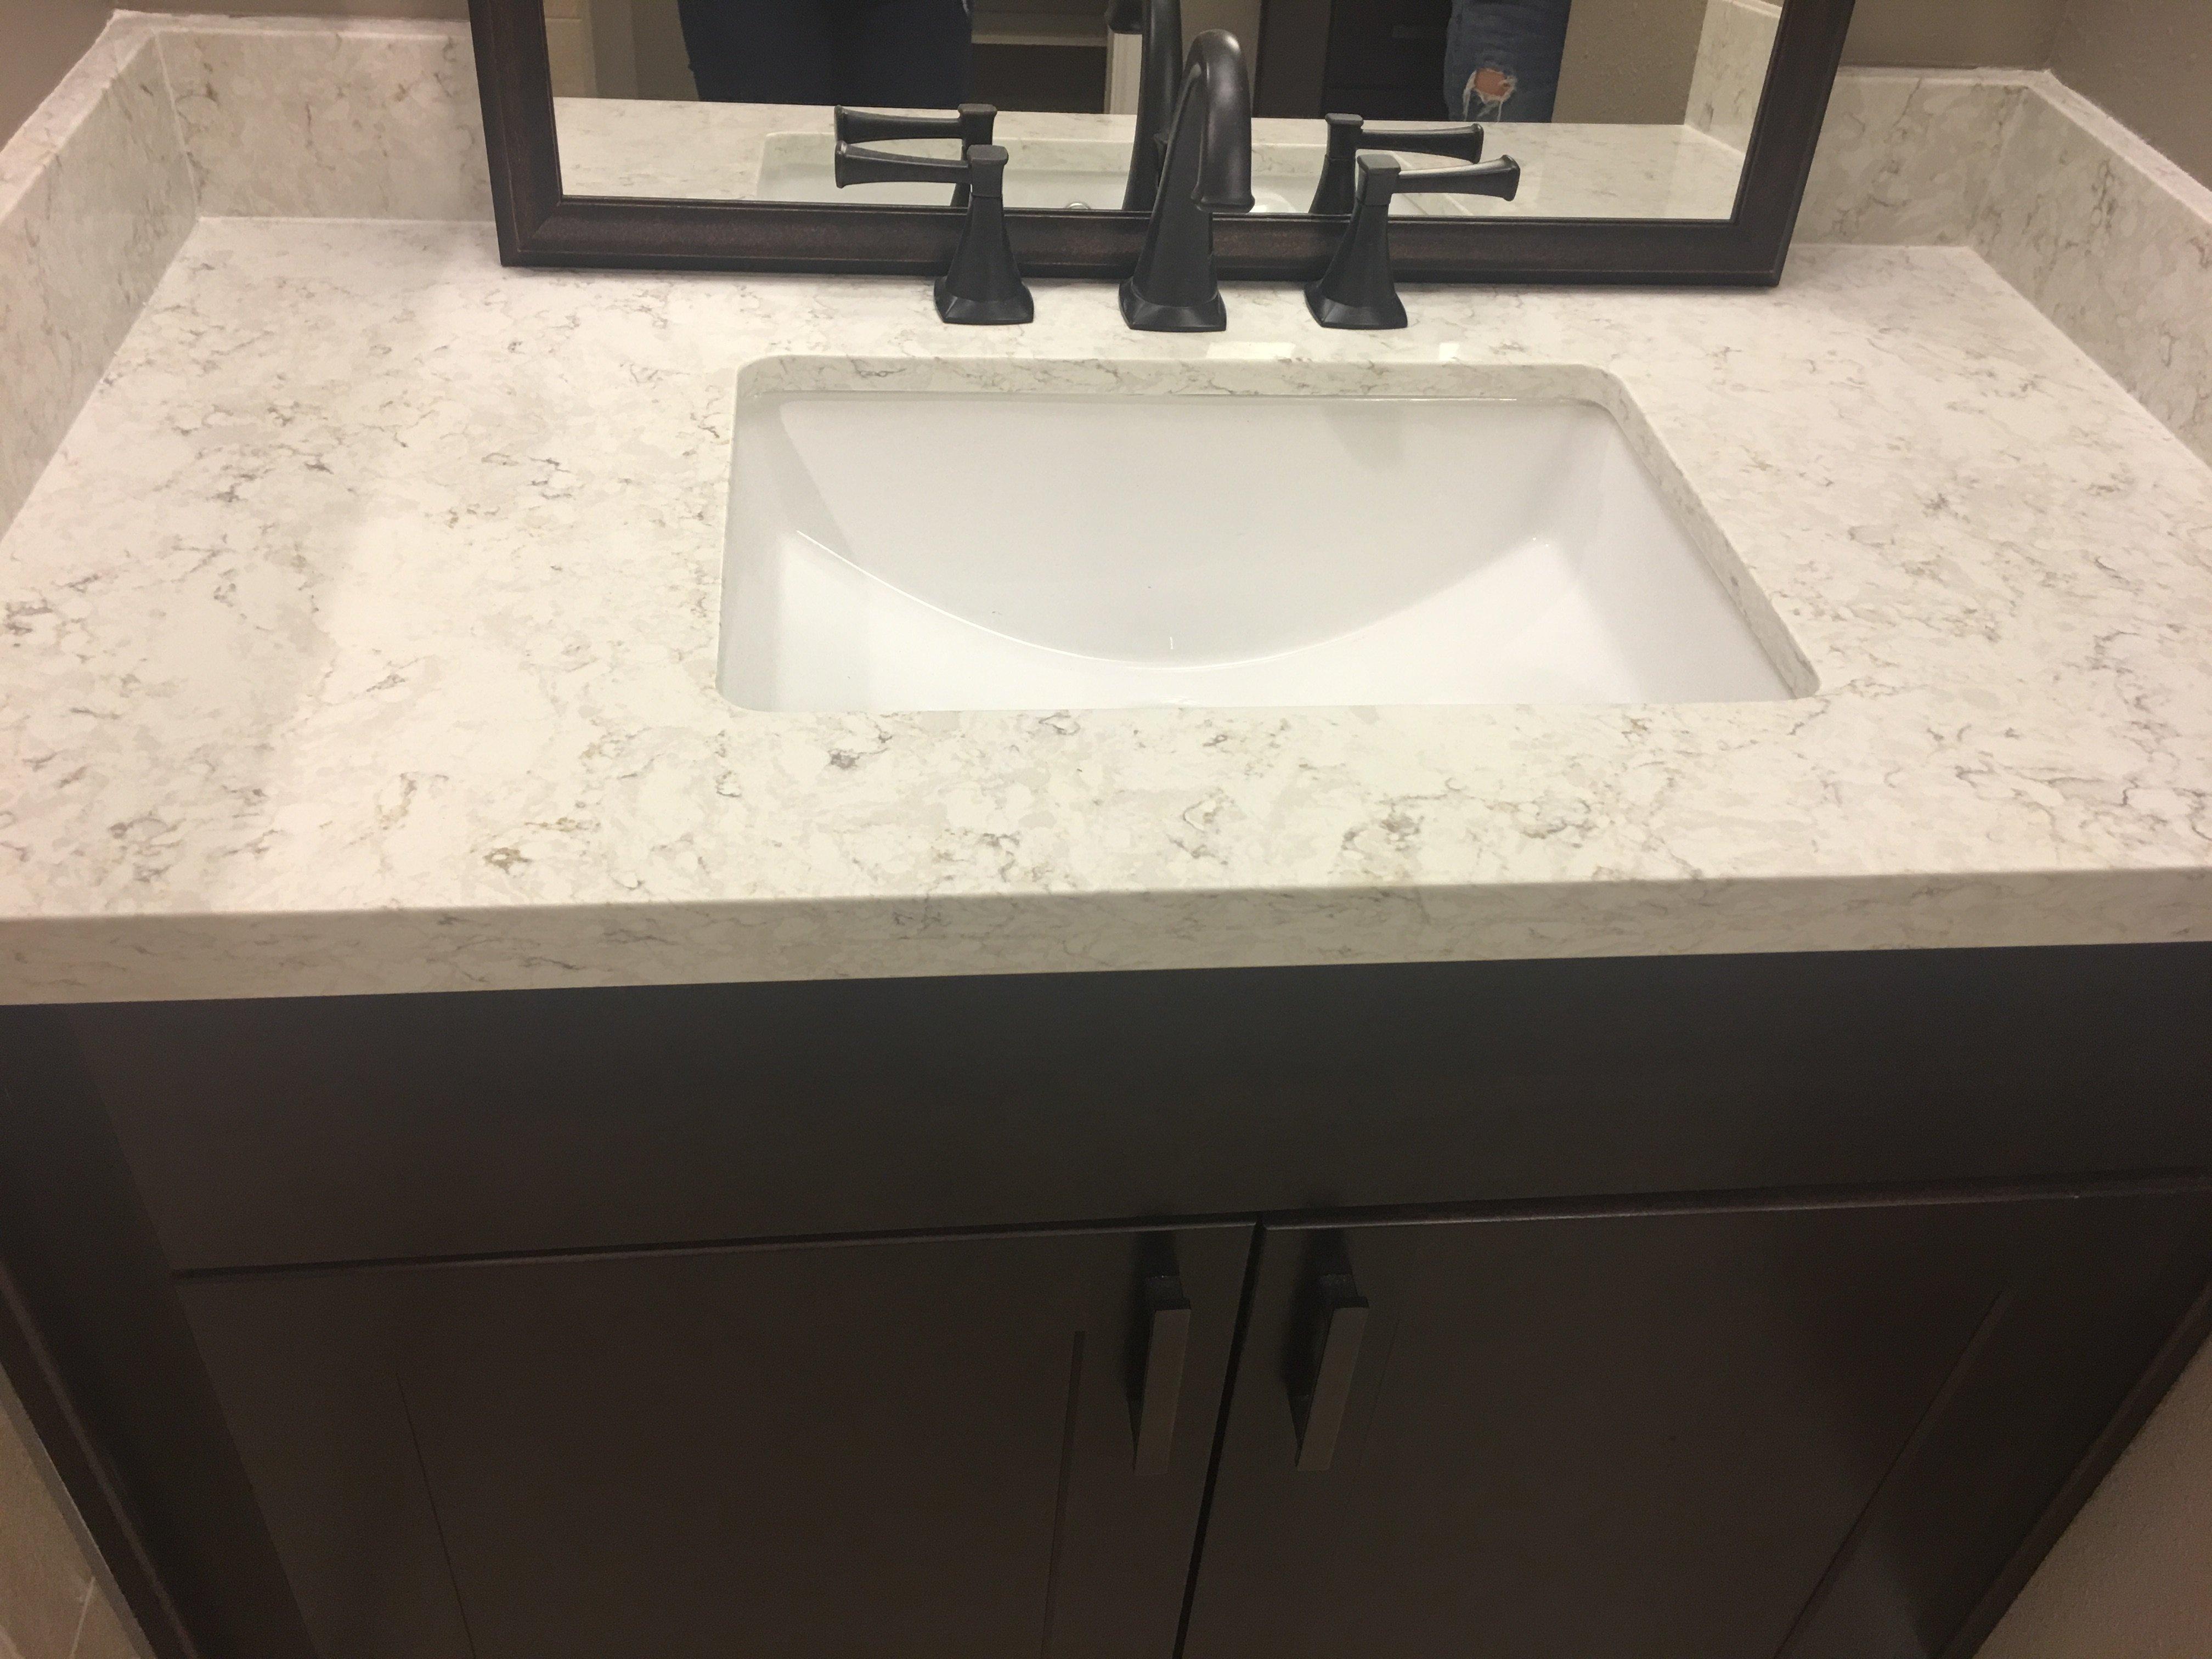 White Rectangle Undermount sink